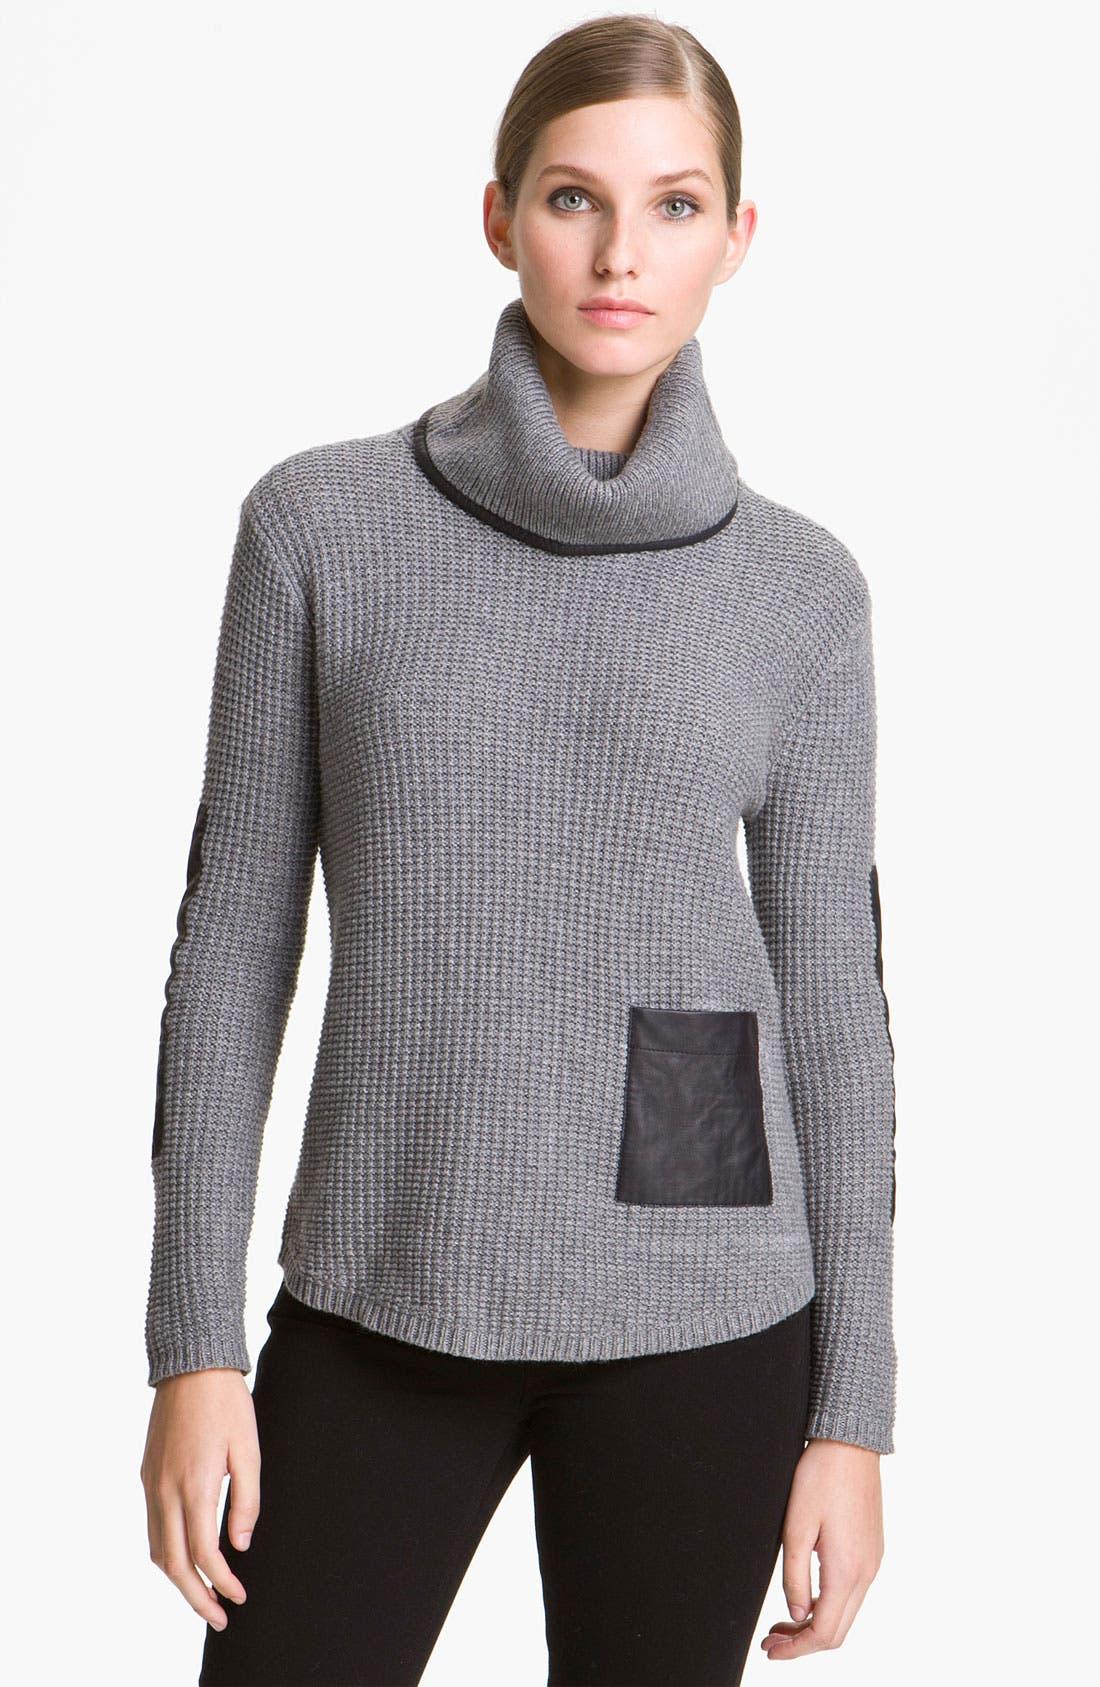 Alternate Image 1 Selected - Elizabeth and James Leather Trim Turtleneck Sweater